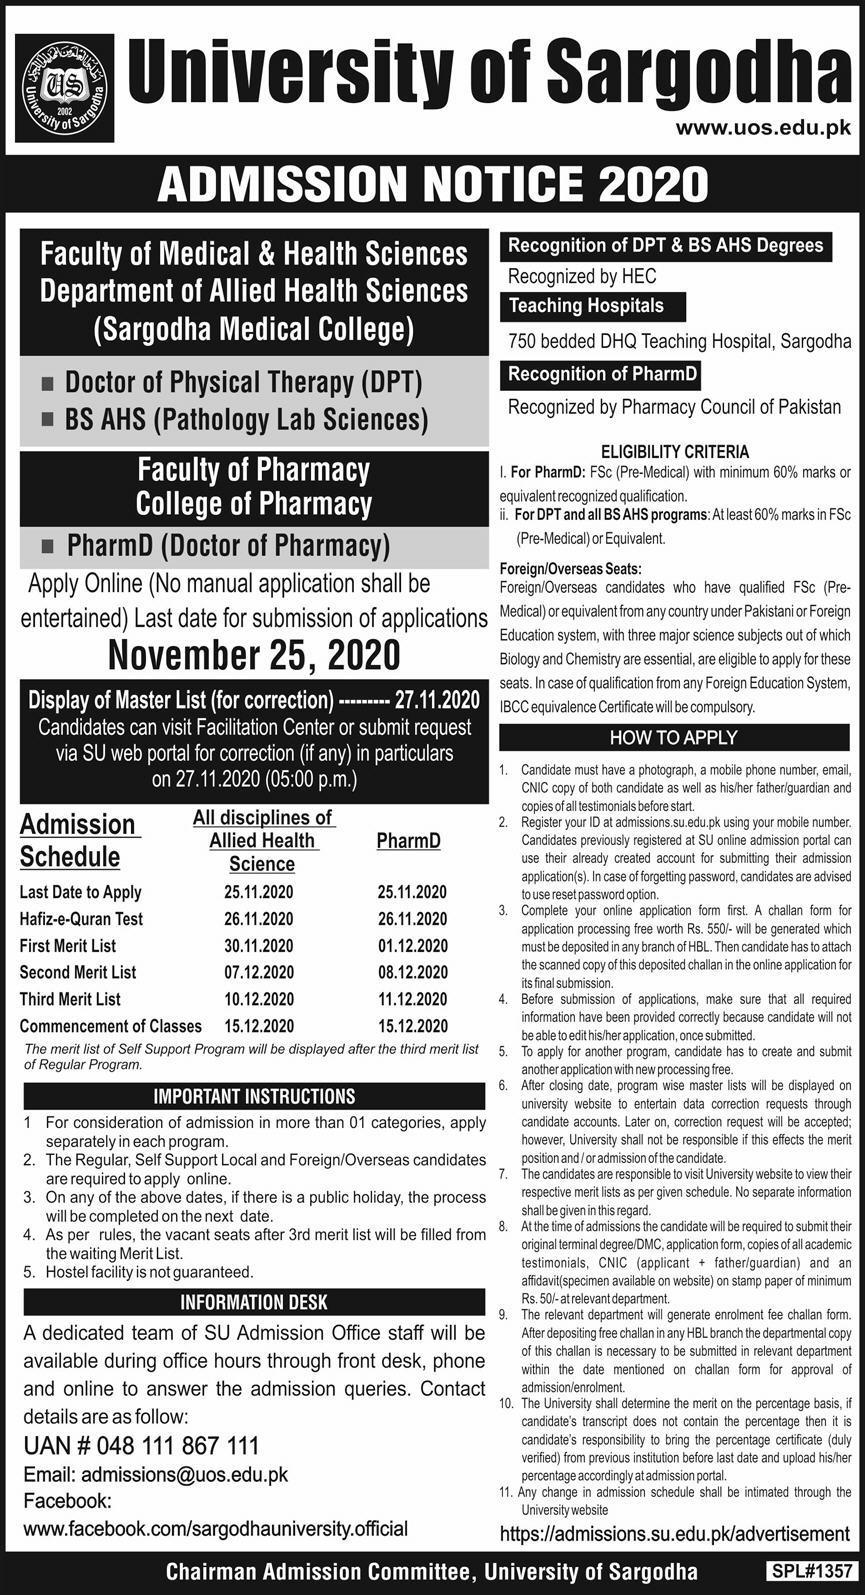 University of Sargodha DPT, BS AHS & Pharm-D Admission 2020